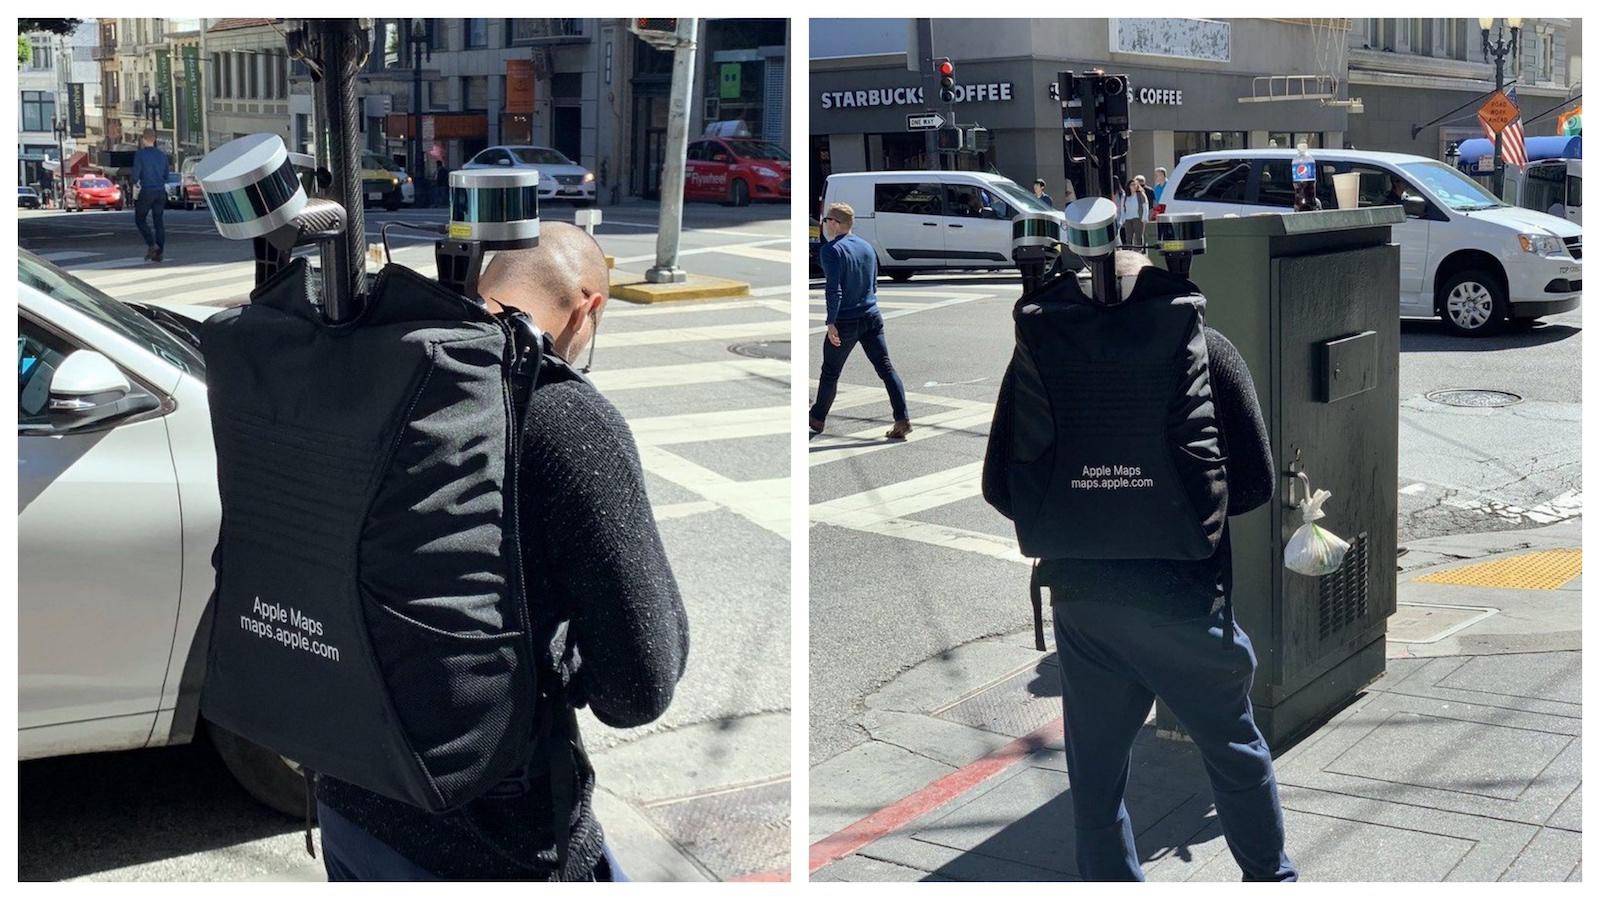 Apple Maps Man on foot